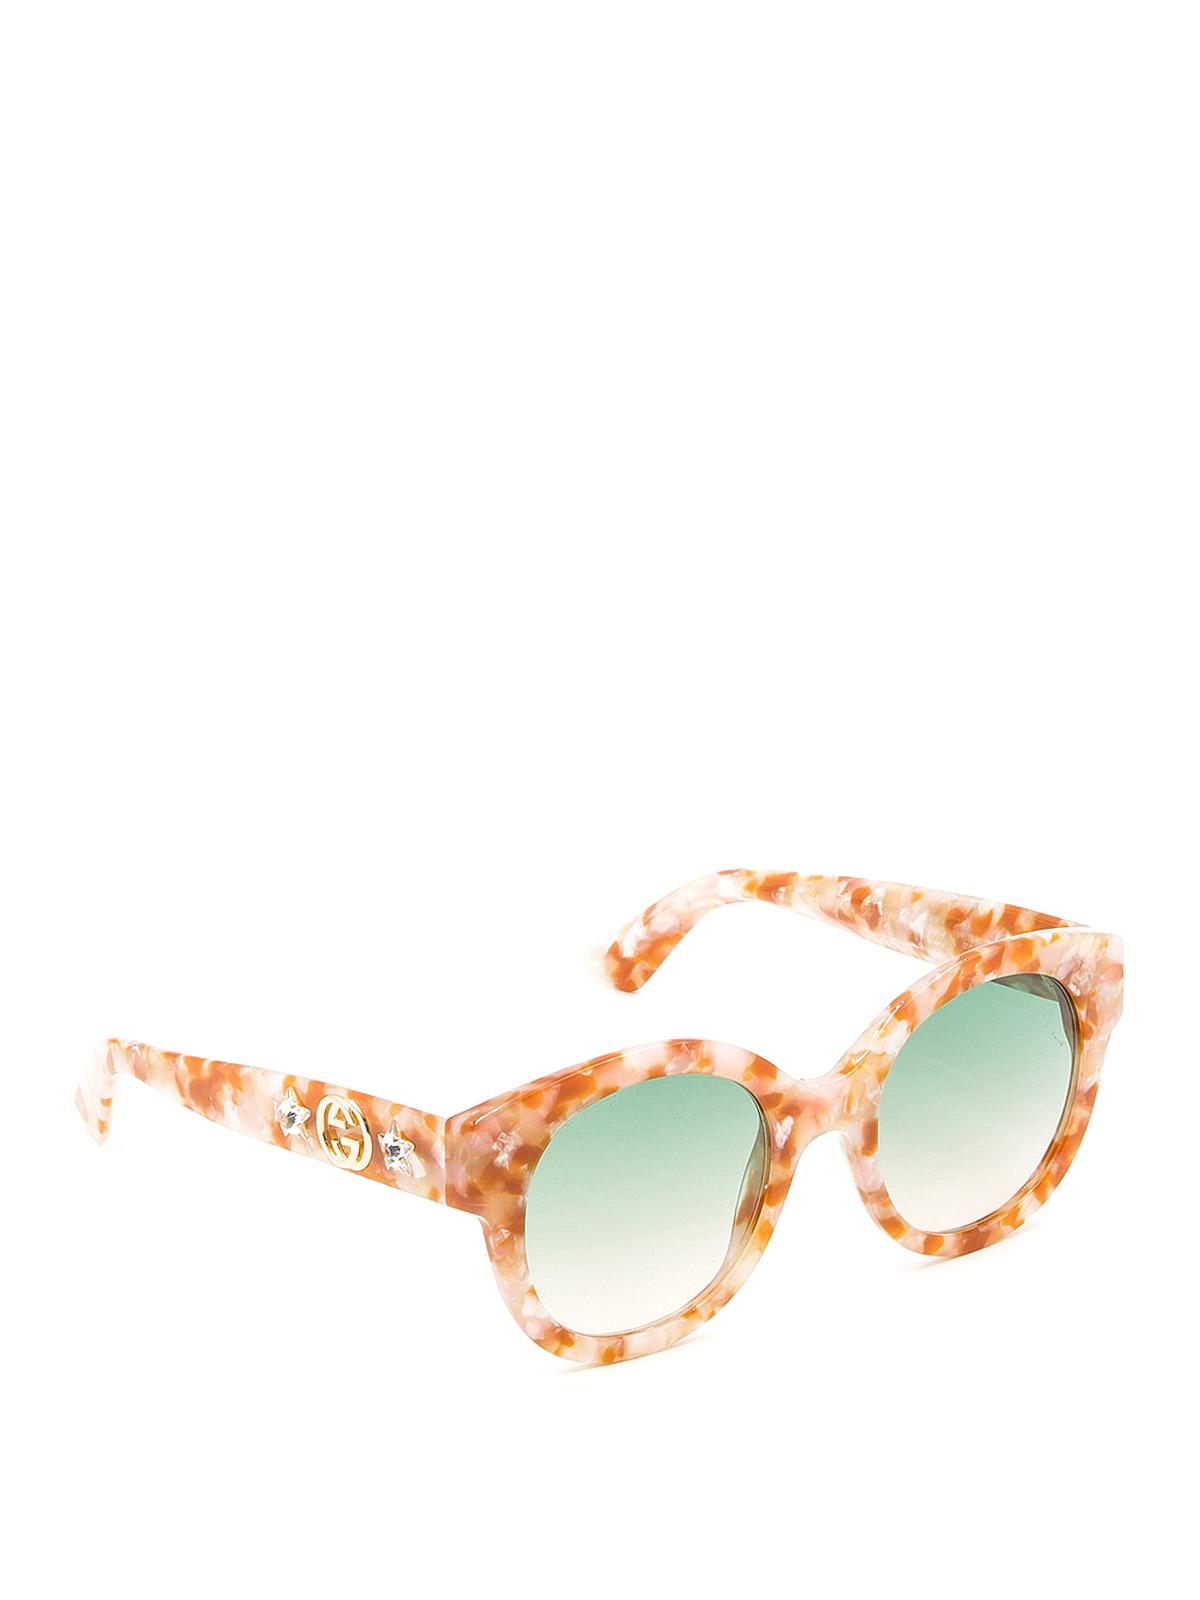 Gucci Acetate Star Gg Round Sunglasses In Orange